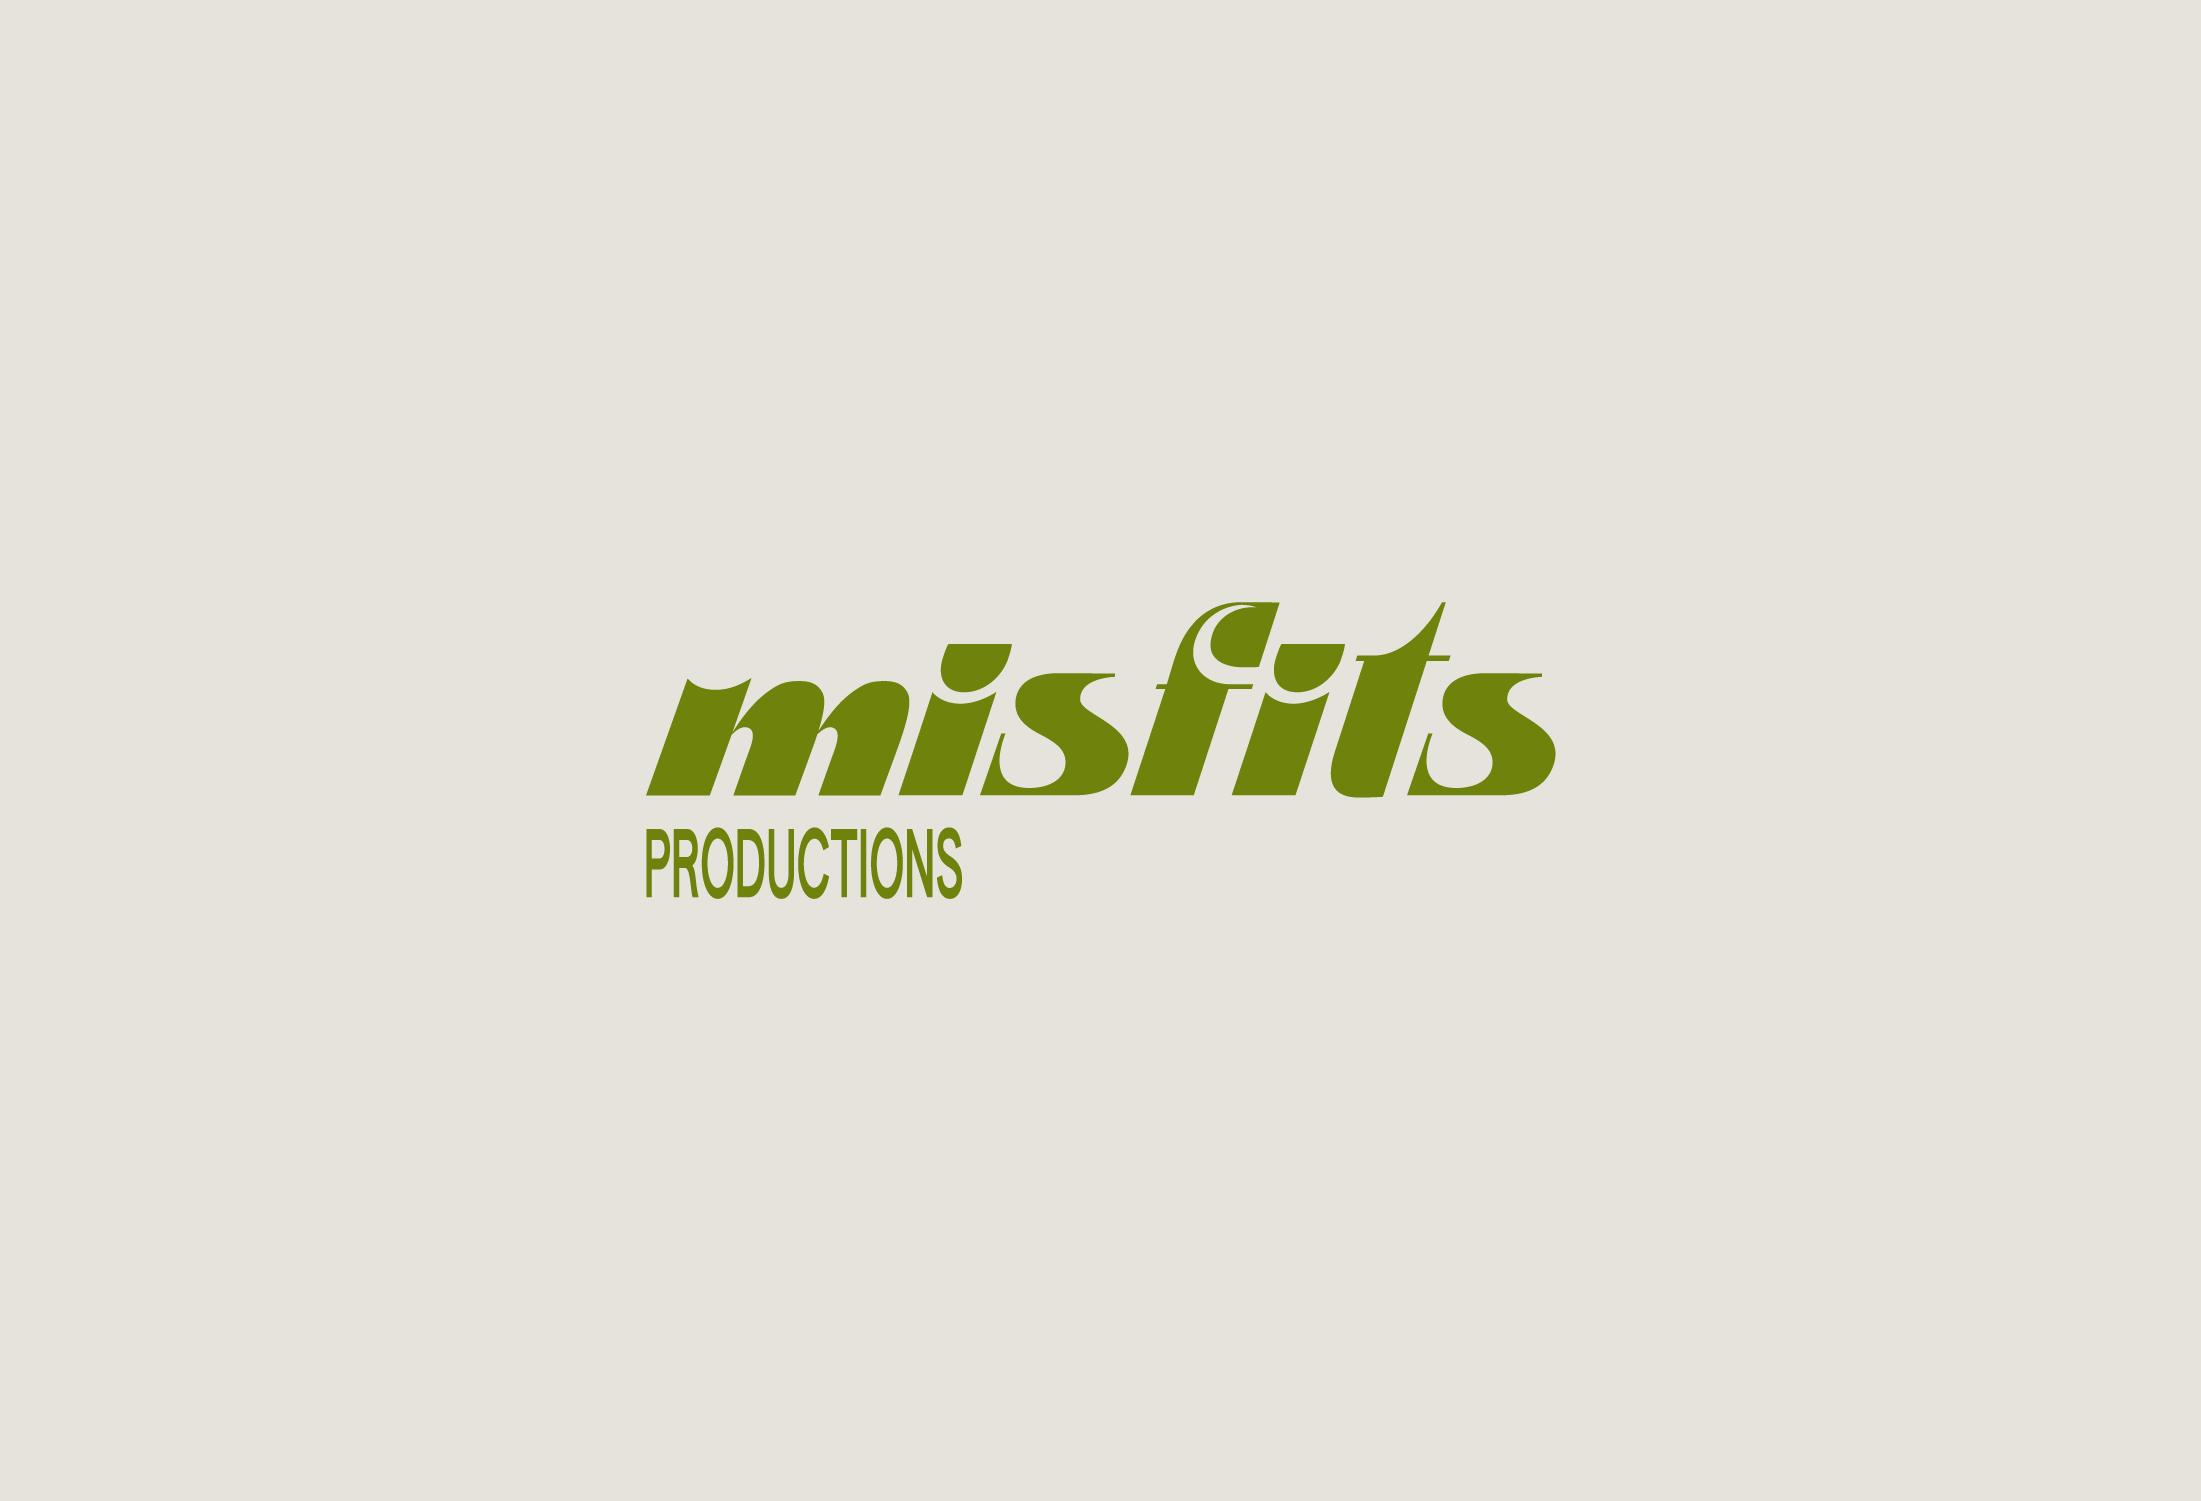 MSFTS_Sec_Logo_2_